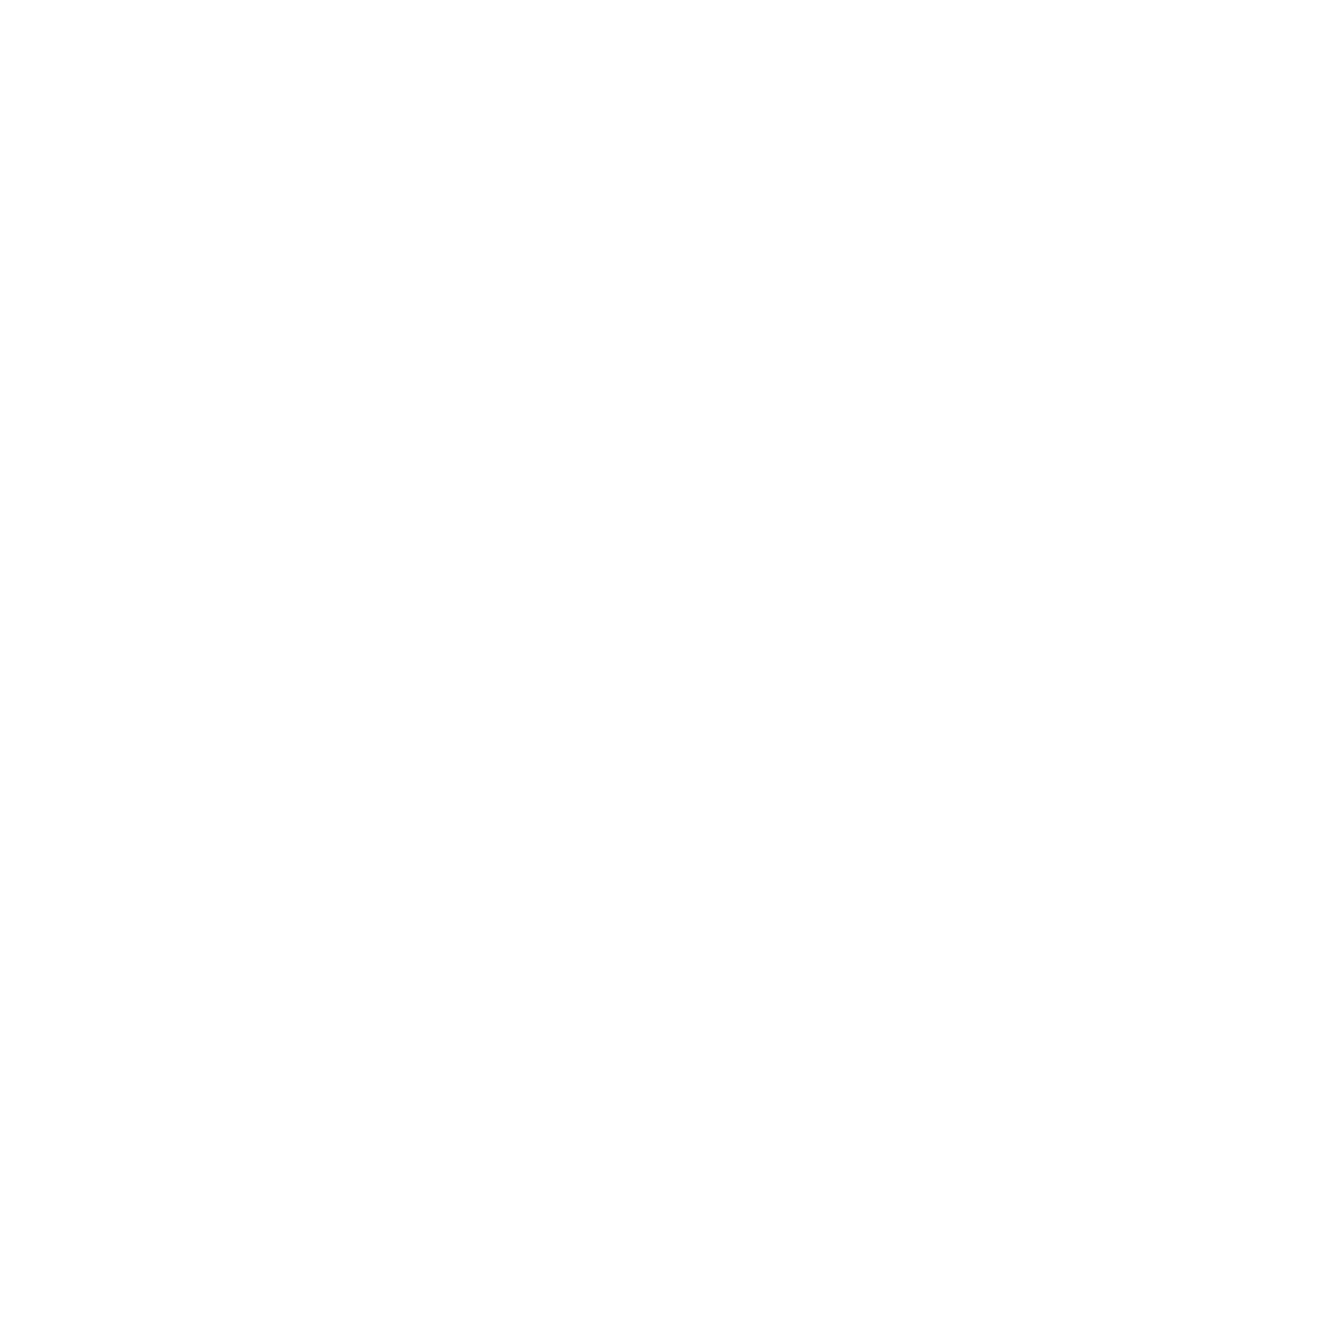 REWILD OUTDOOR TOKYO(リワイルド アウトドア トーキョー)日本橋茅場町店|アウトドアカフェ